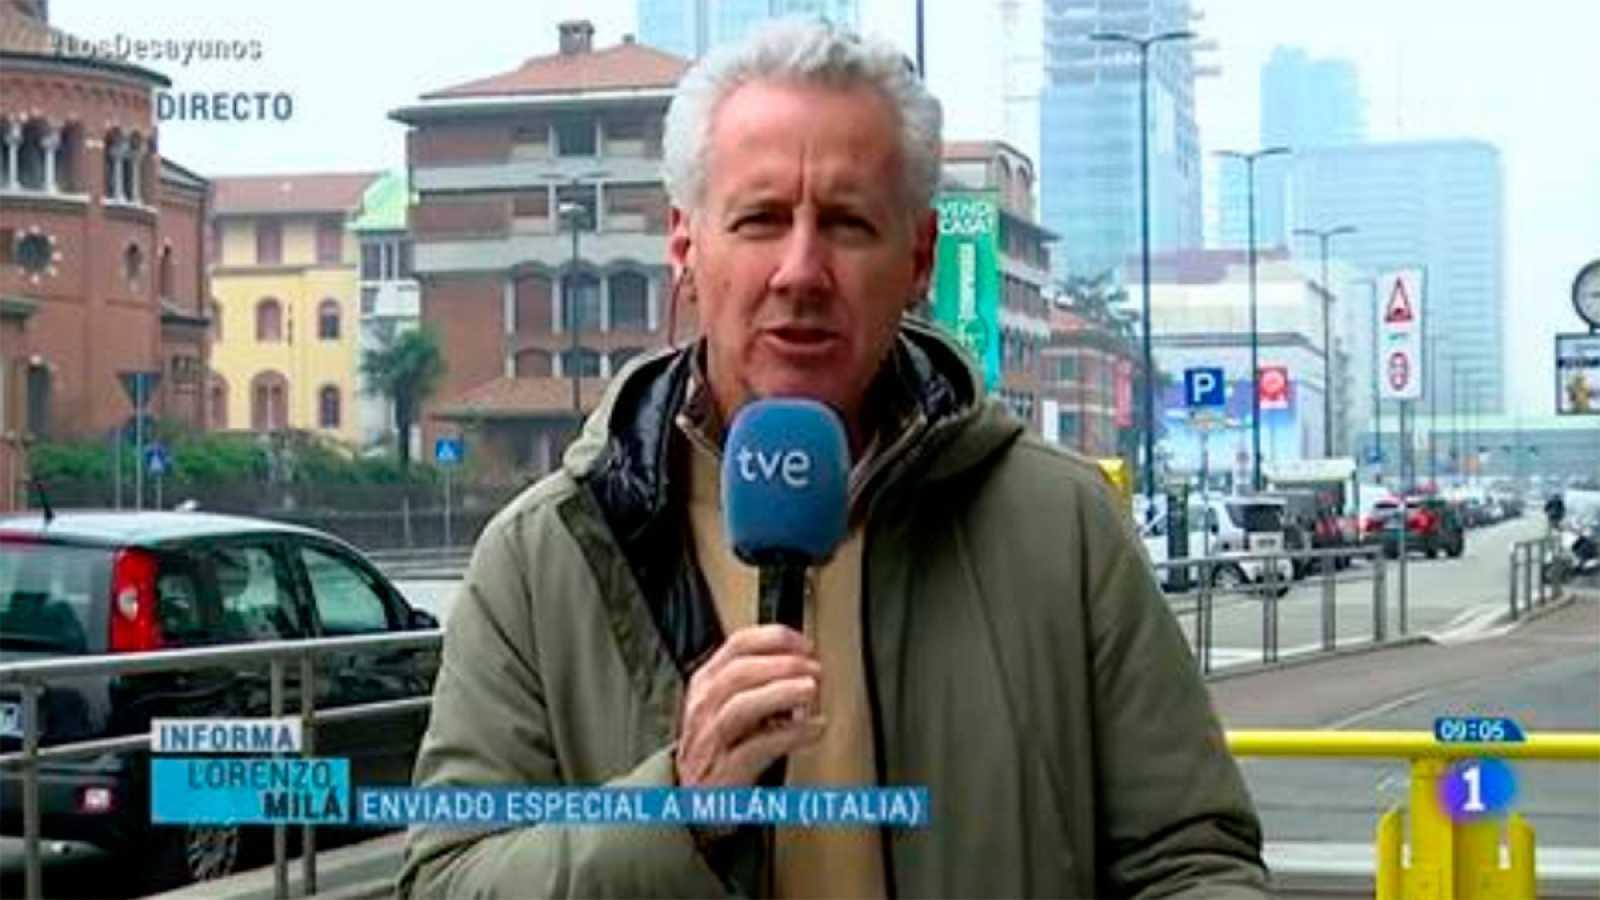 Lorenzo Milá deixarà la corresponsalia de TVE a Roma després de sis anys